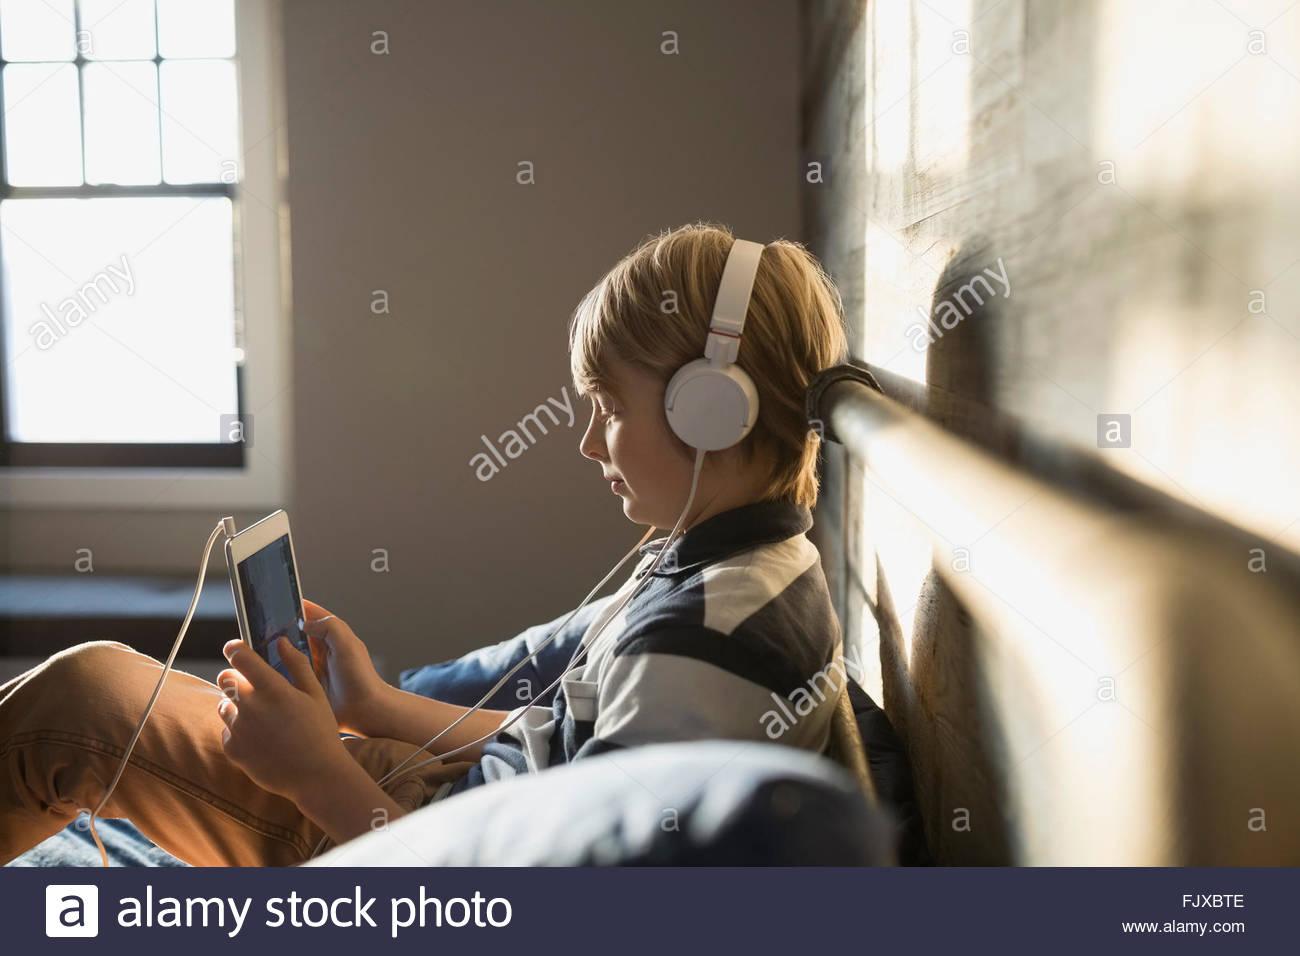 Junge mit Kopfhörer mit digital-Tablette Stockbild